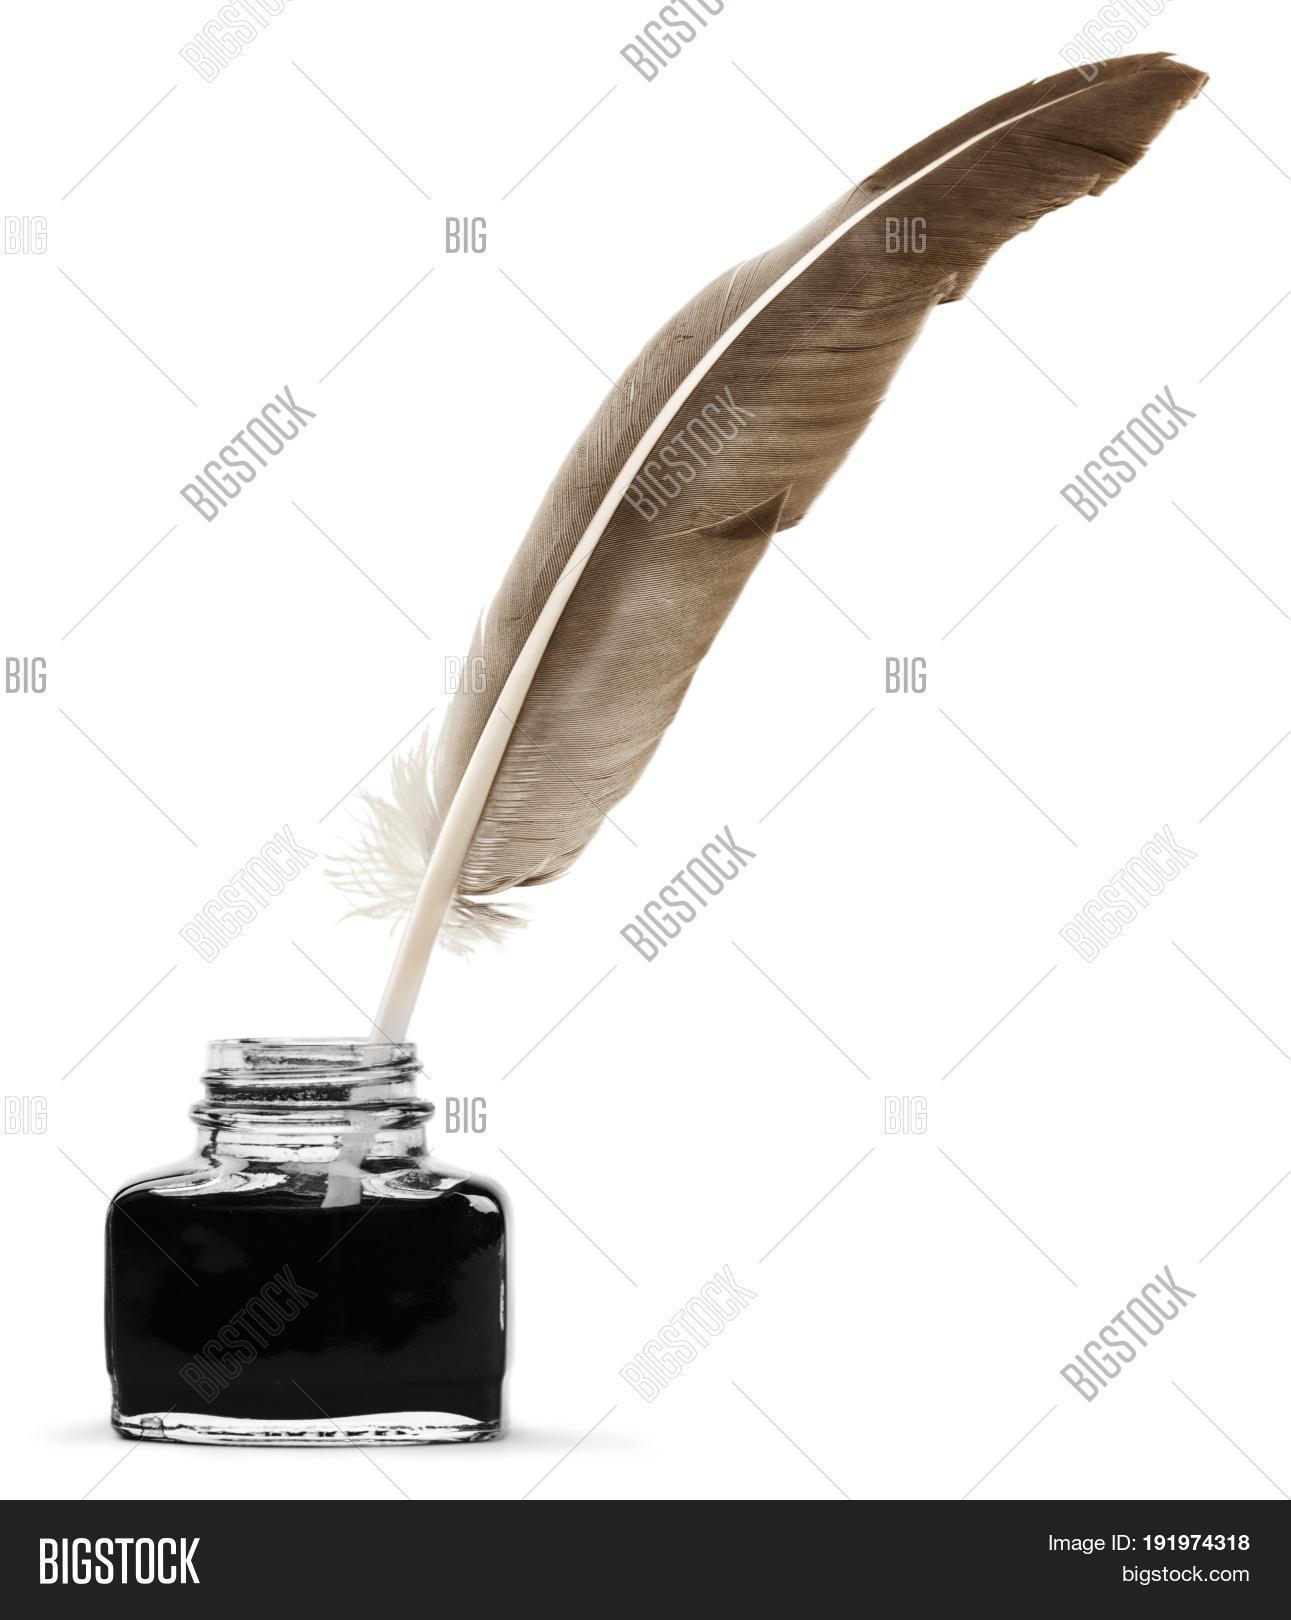 [Black] Vintage Feather Pen Fountain Pen Feather Ink Pen Creative Gift